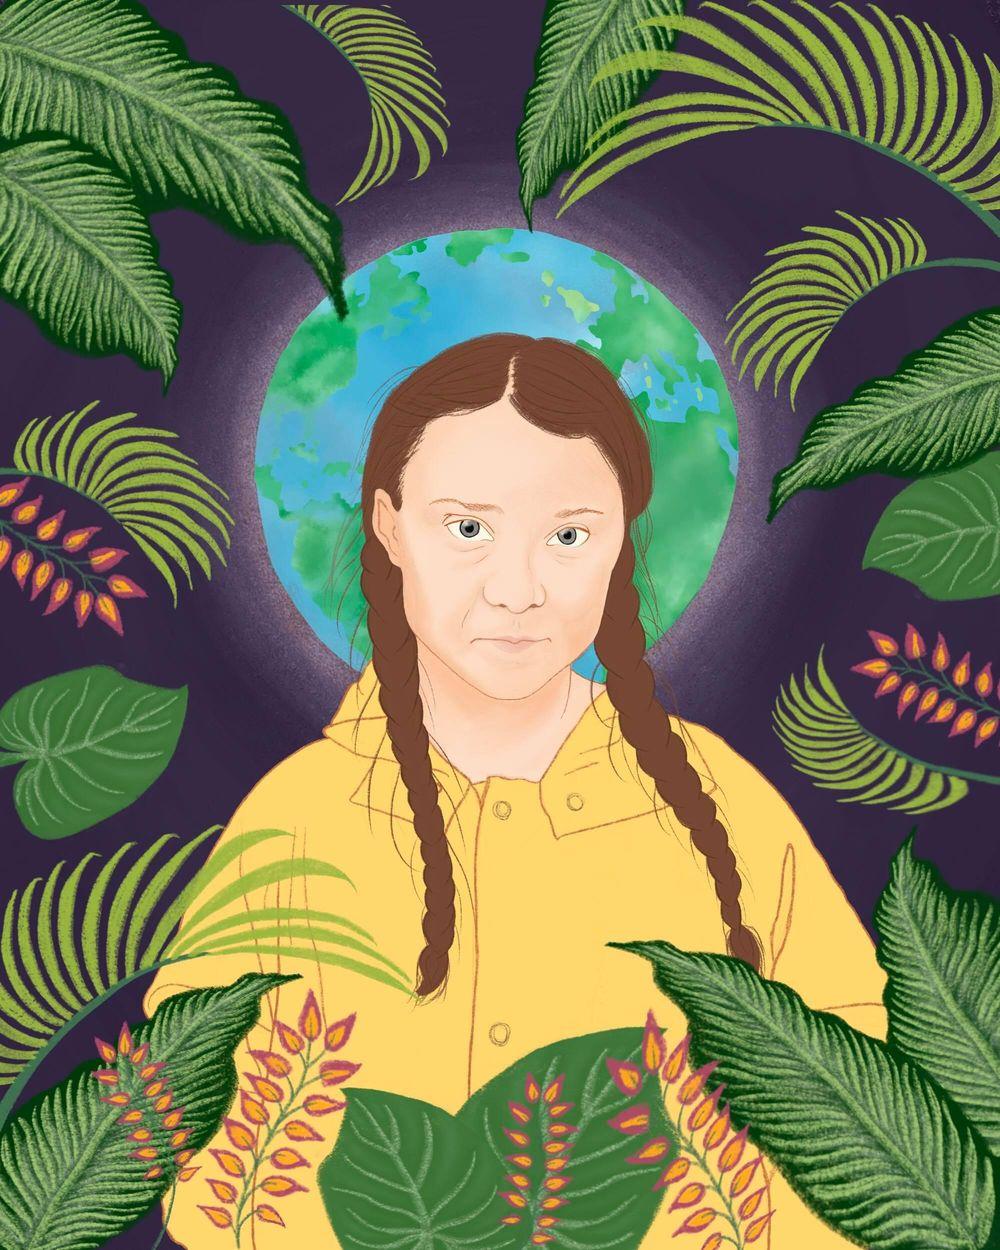 Greta Thunberg illustration - image 1 - student project